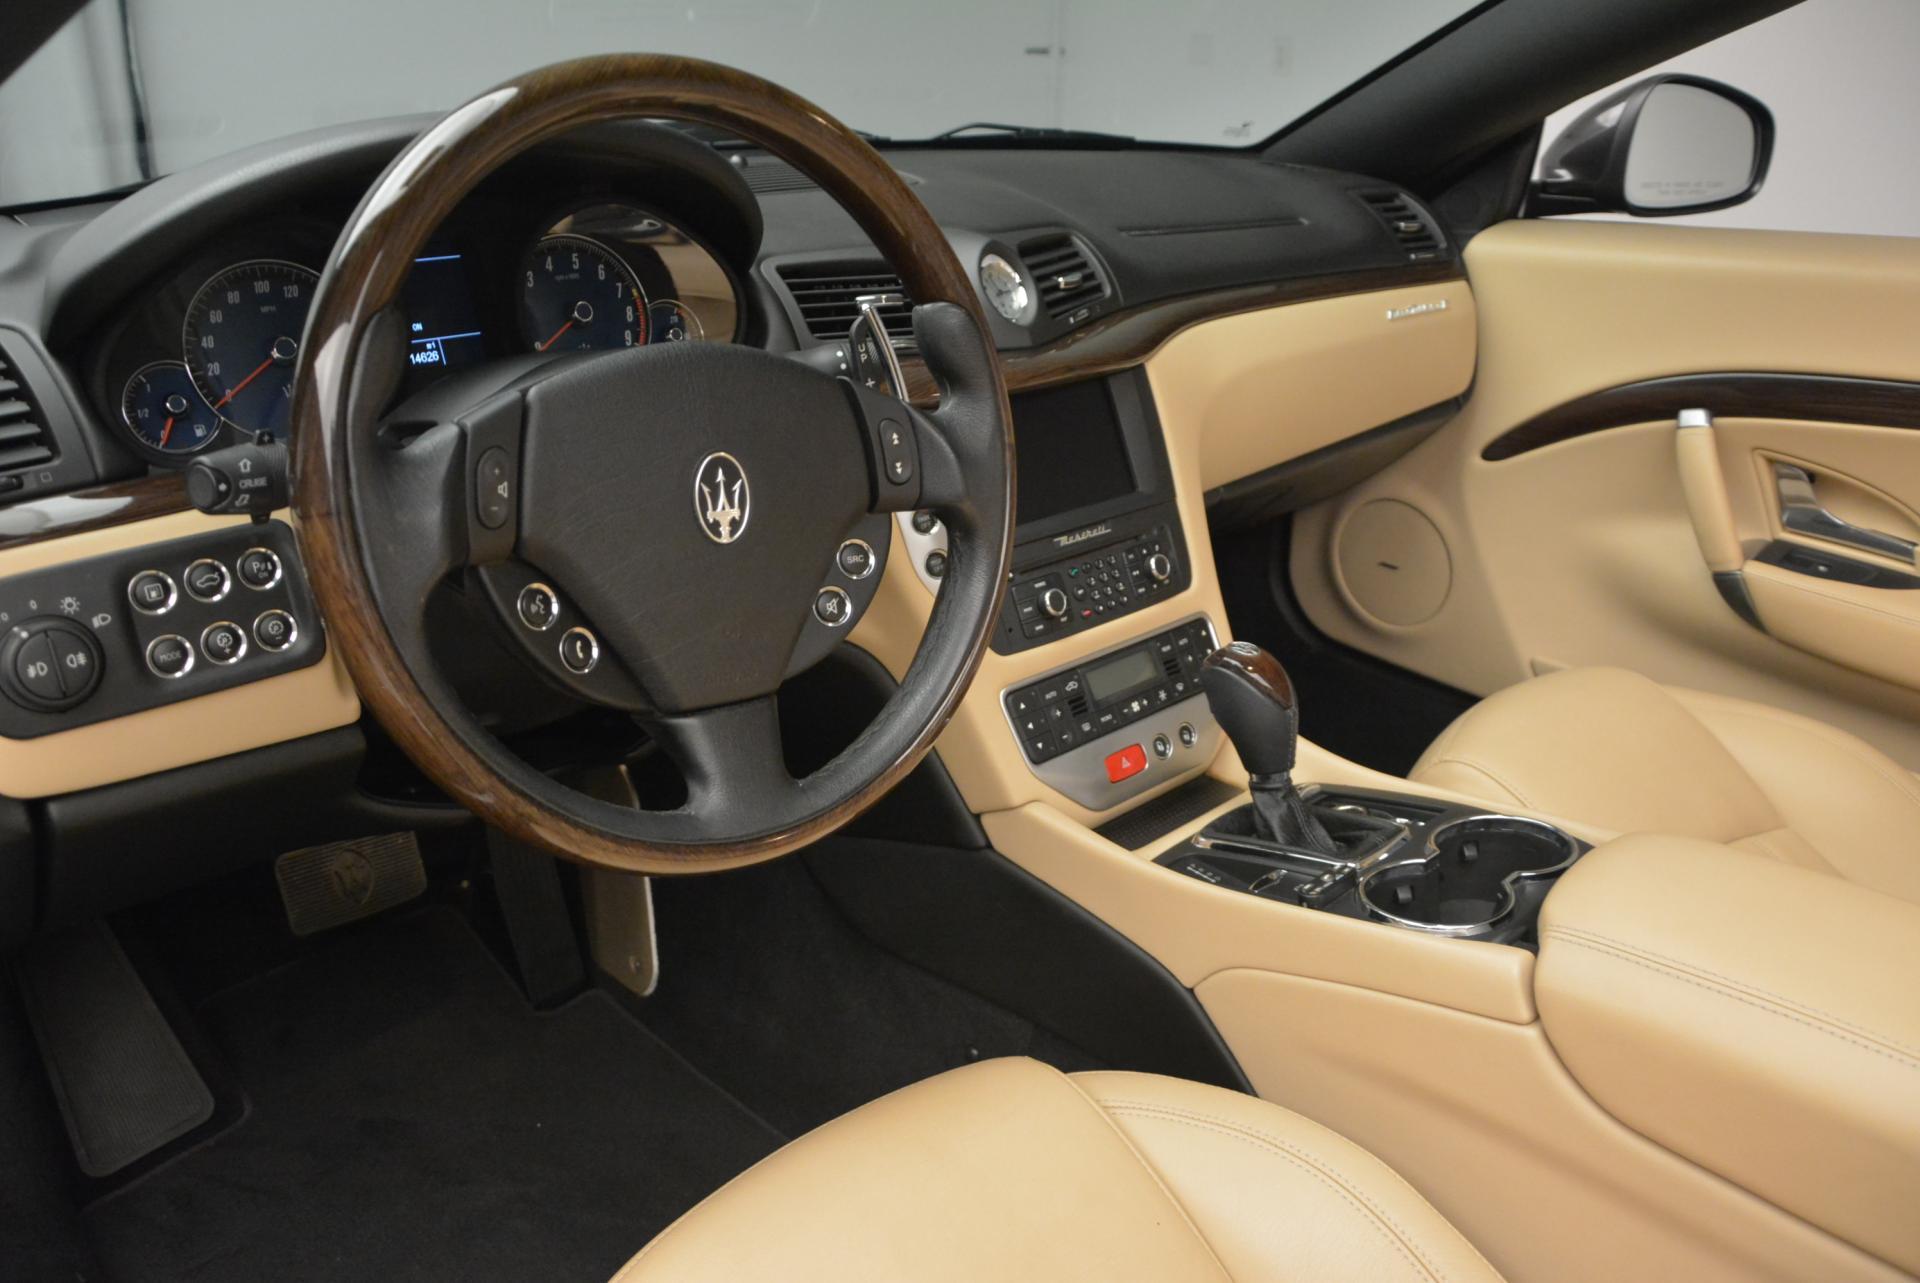 Used 2011 Maserati GranTurismo Base For Sale In Westport, CT 158_p26